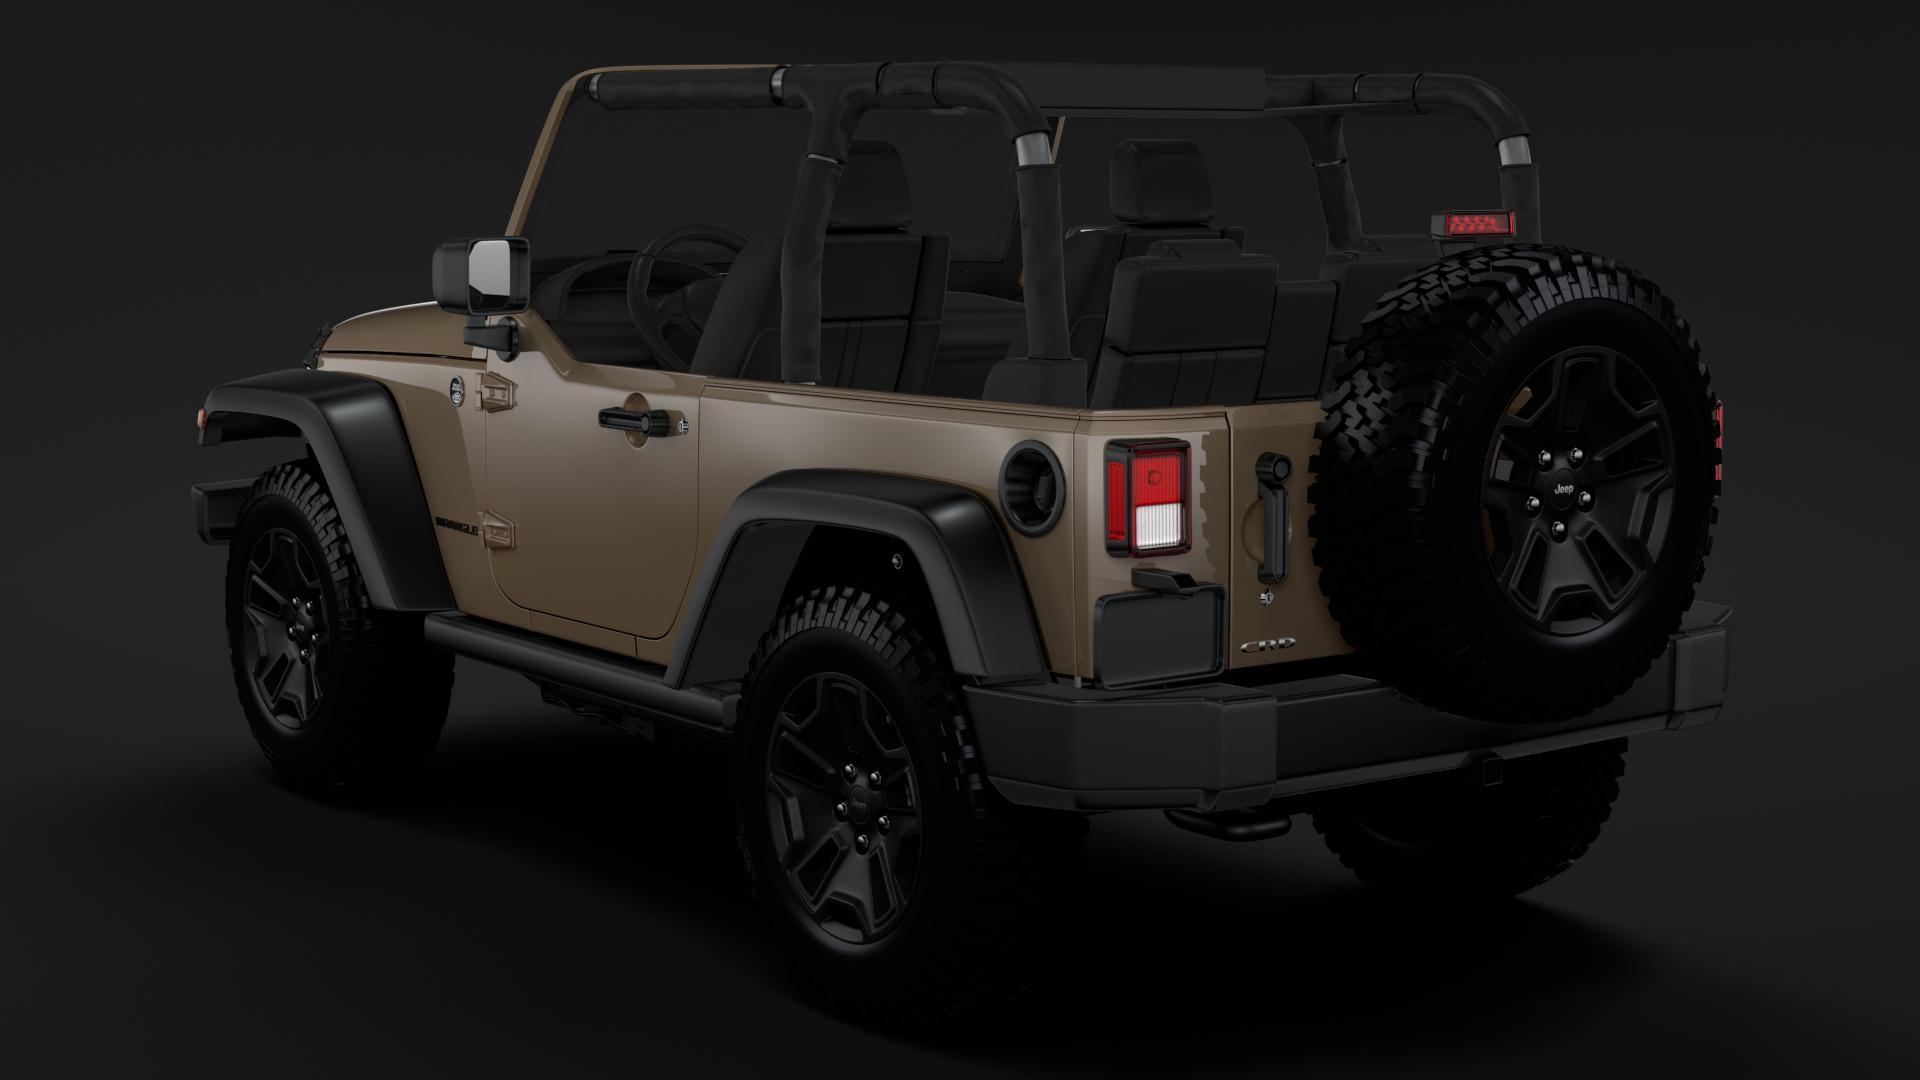 jeep wrangler willys wheeler jk 2017 3d model max fbx c4d lwo ma mb hrc xsi obj 276801